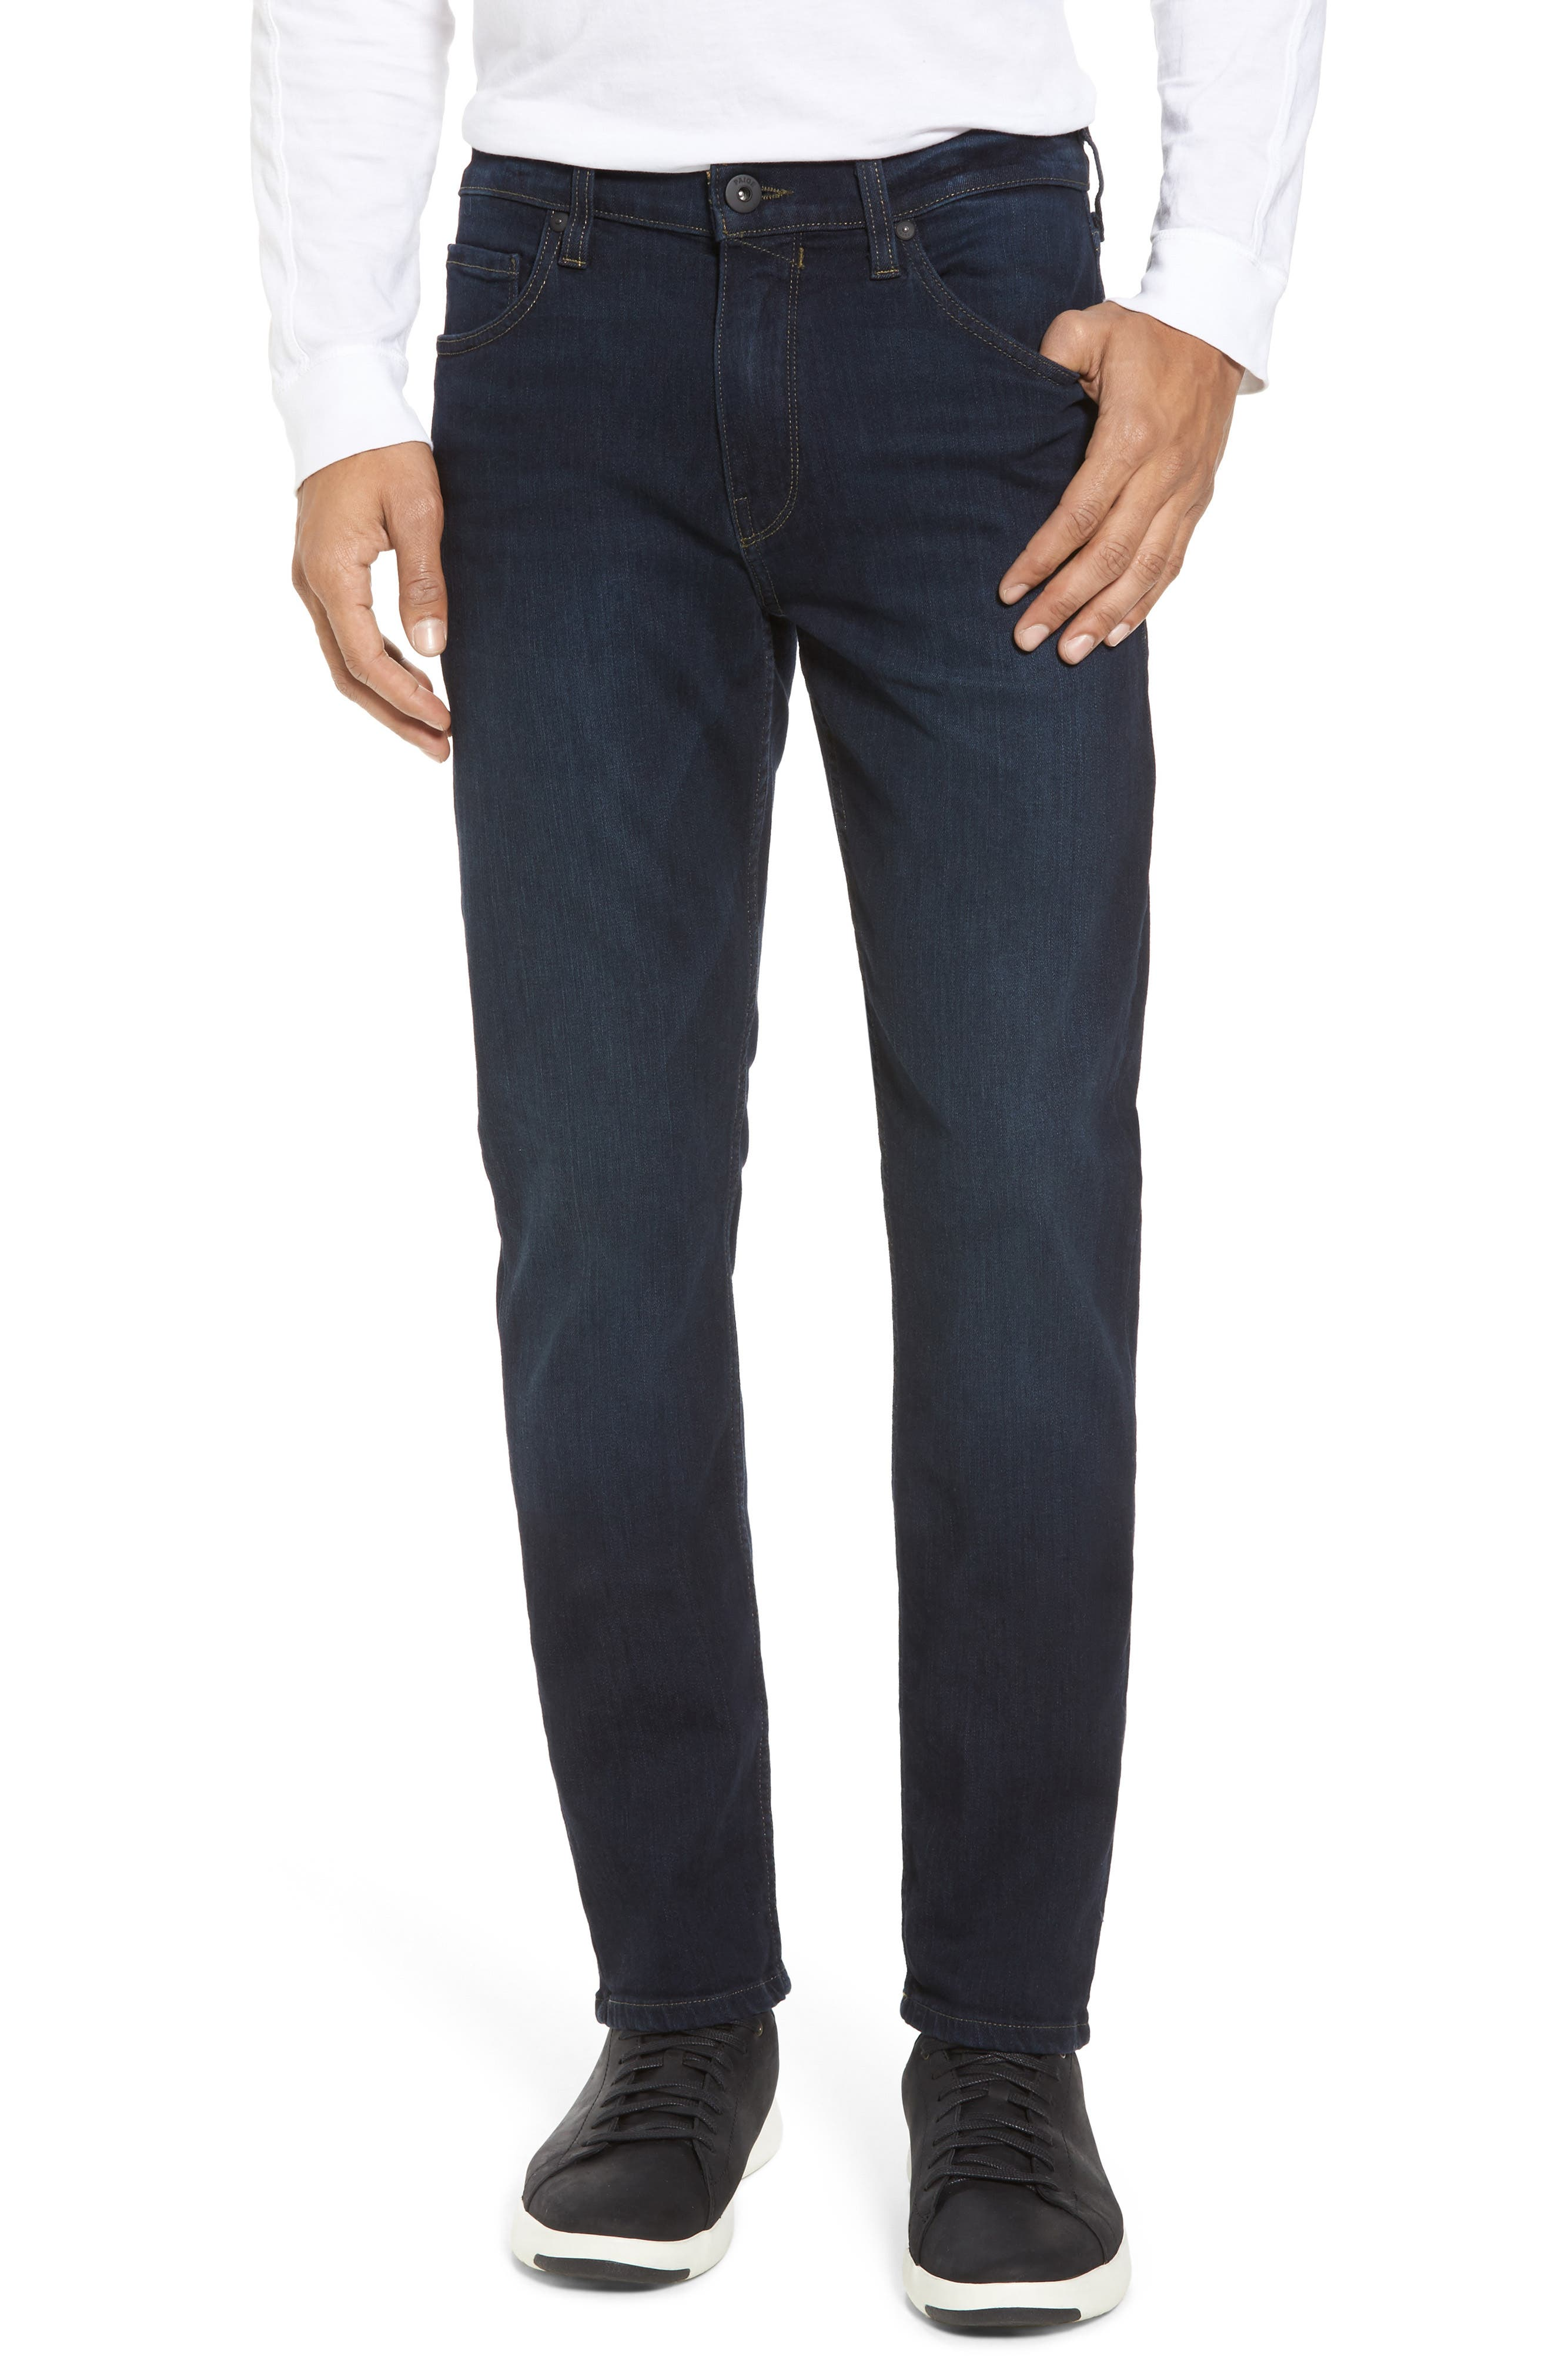 PAIGE Lennox Slim Fit Jeans (Jonathan)